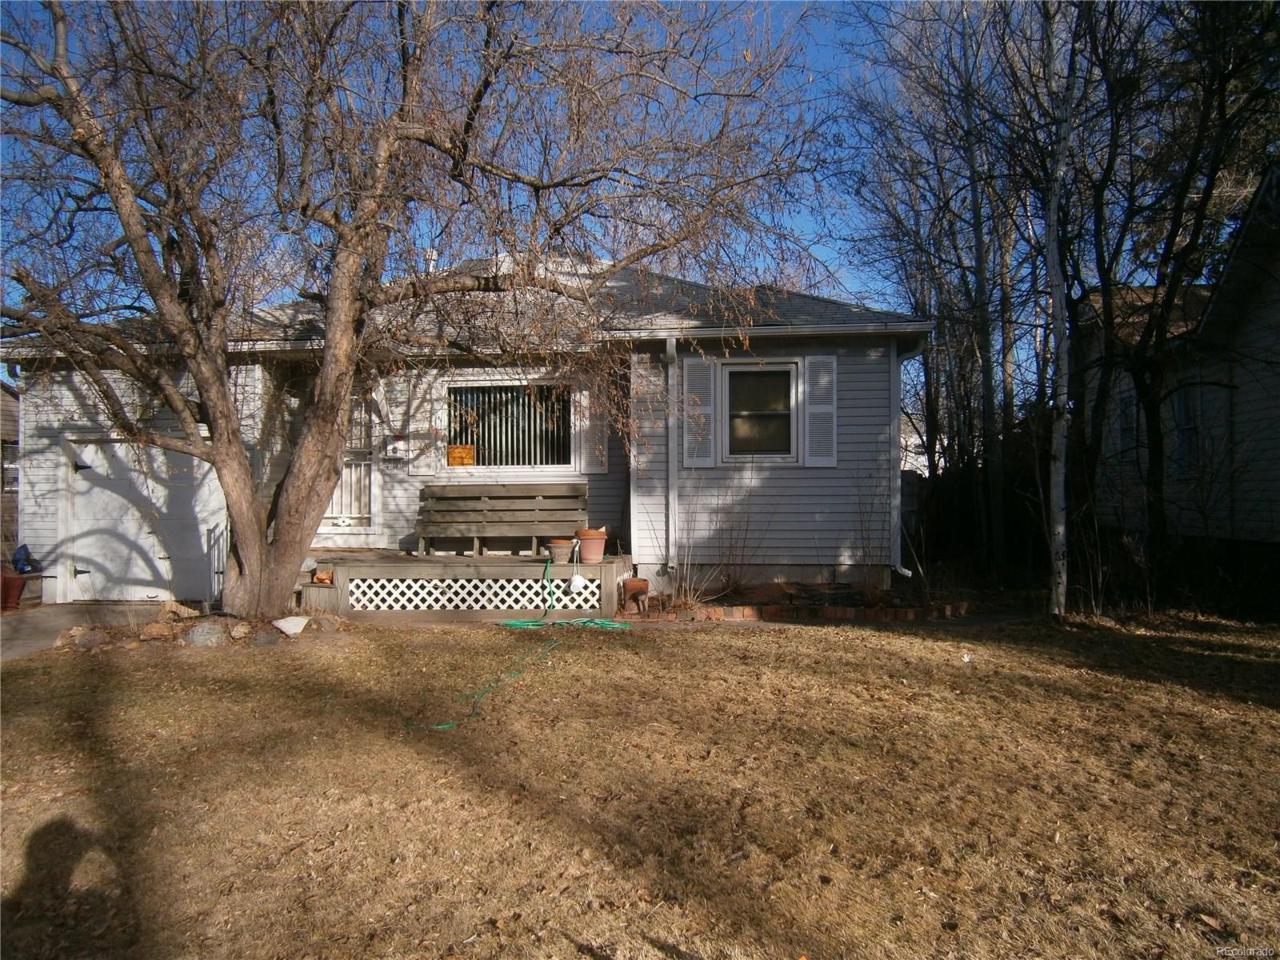 4190 S Elati Street, Englewood, CO 80110 (MLS #6115037) :: 8z Real Estate